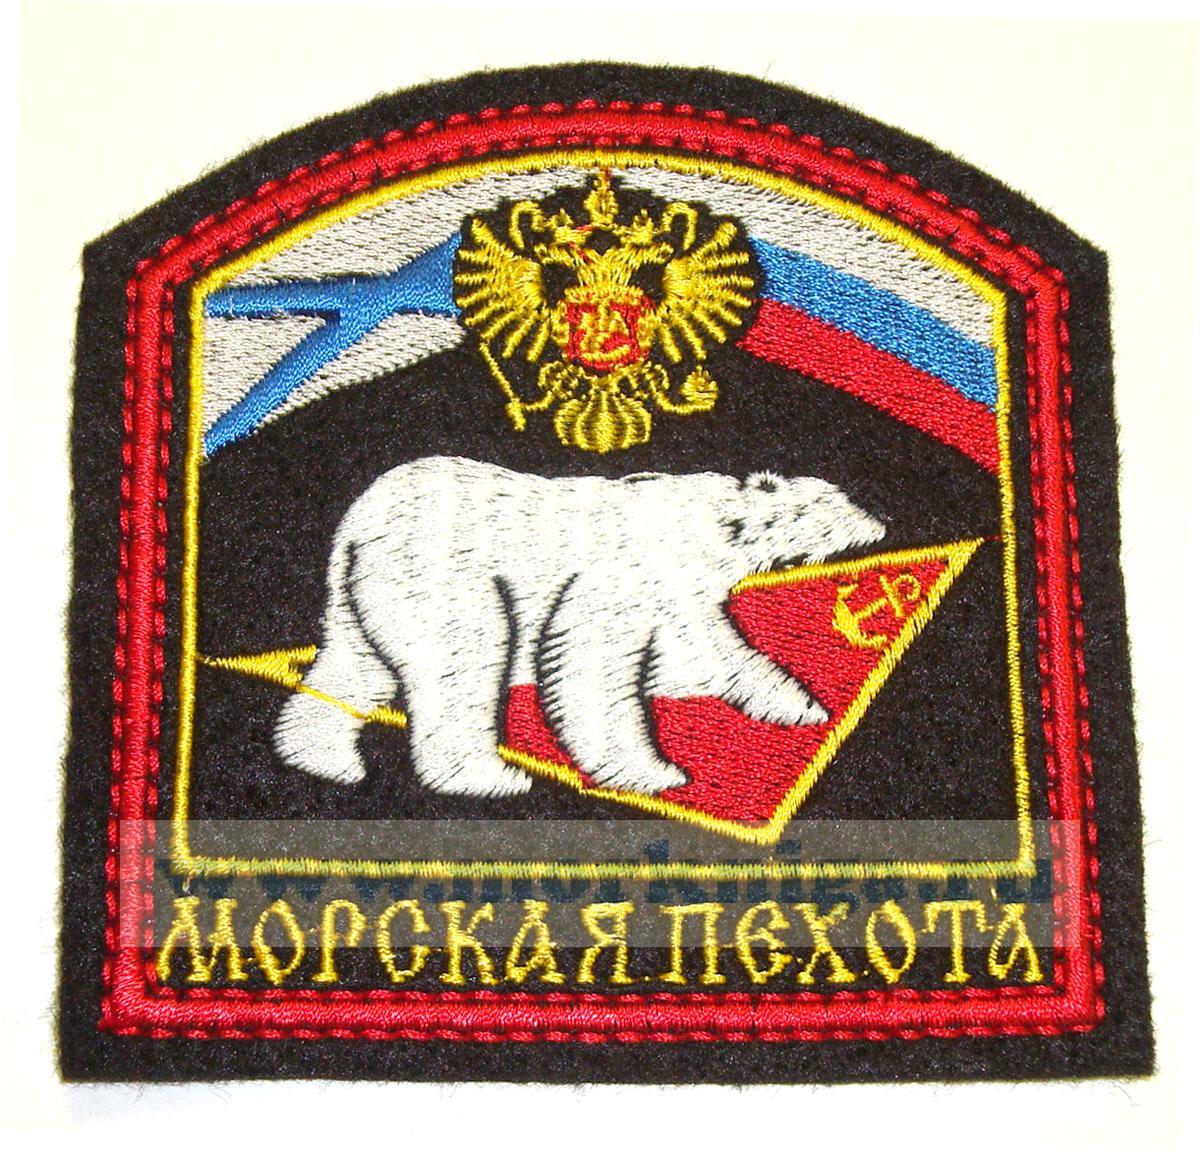 "Нашивка вышитая нарукавная ""Морская пехота"" (медведь, герб, флаги, шелковая нить)"